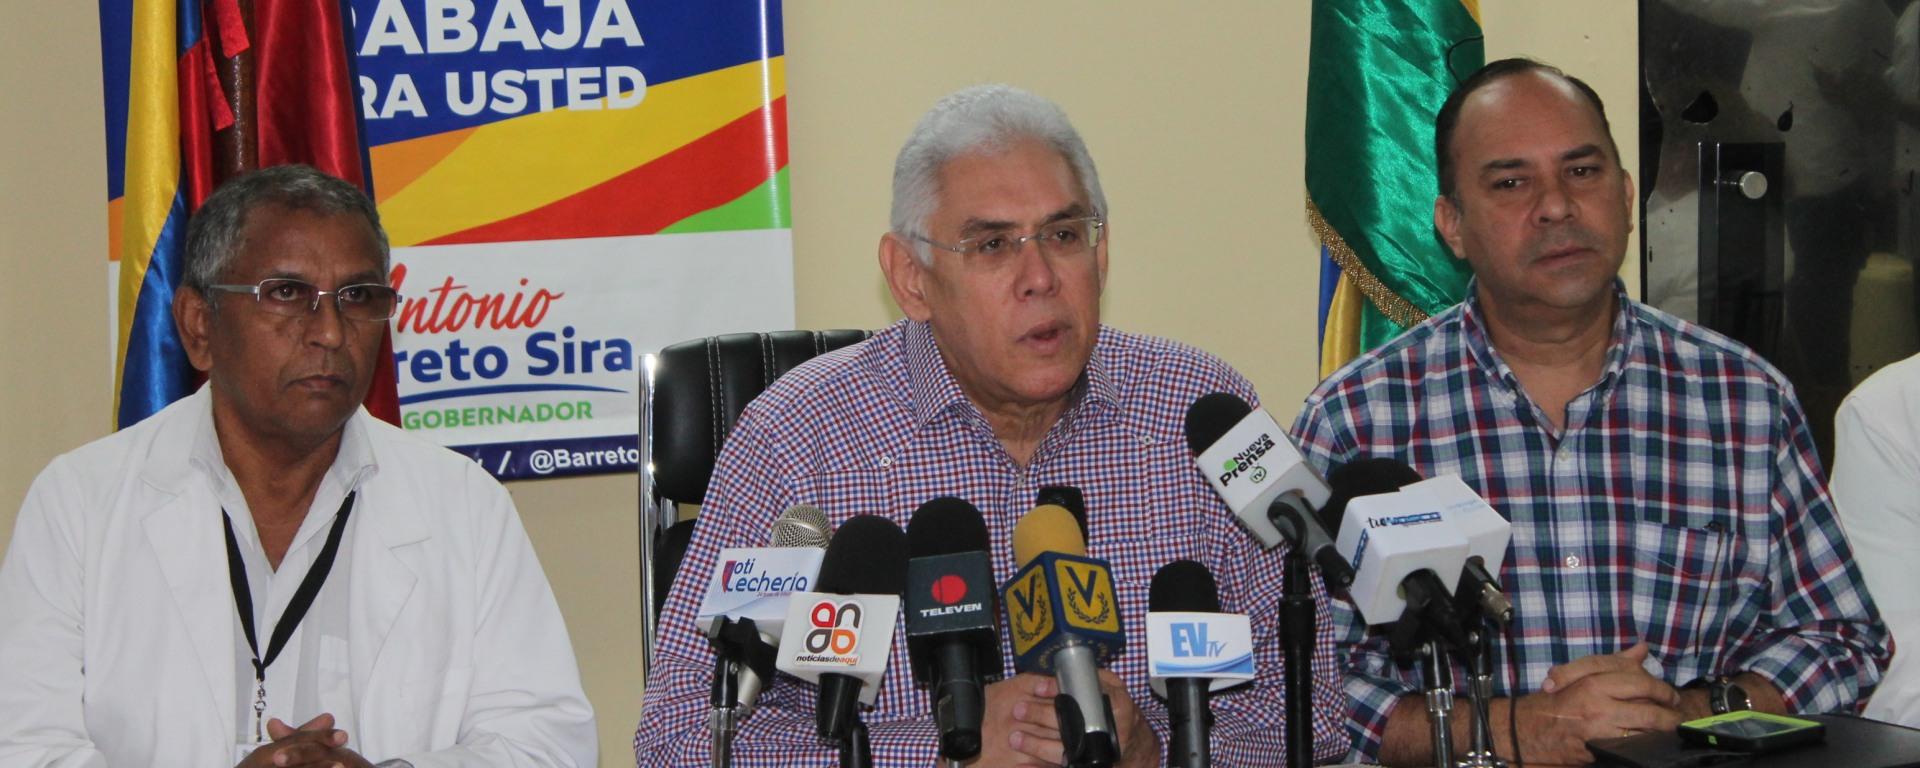 Antonio Barreto Sira